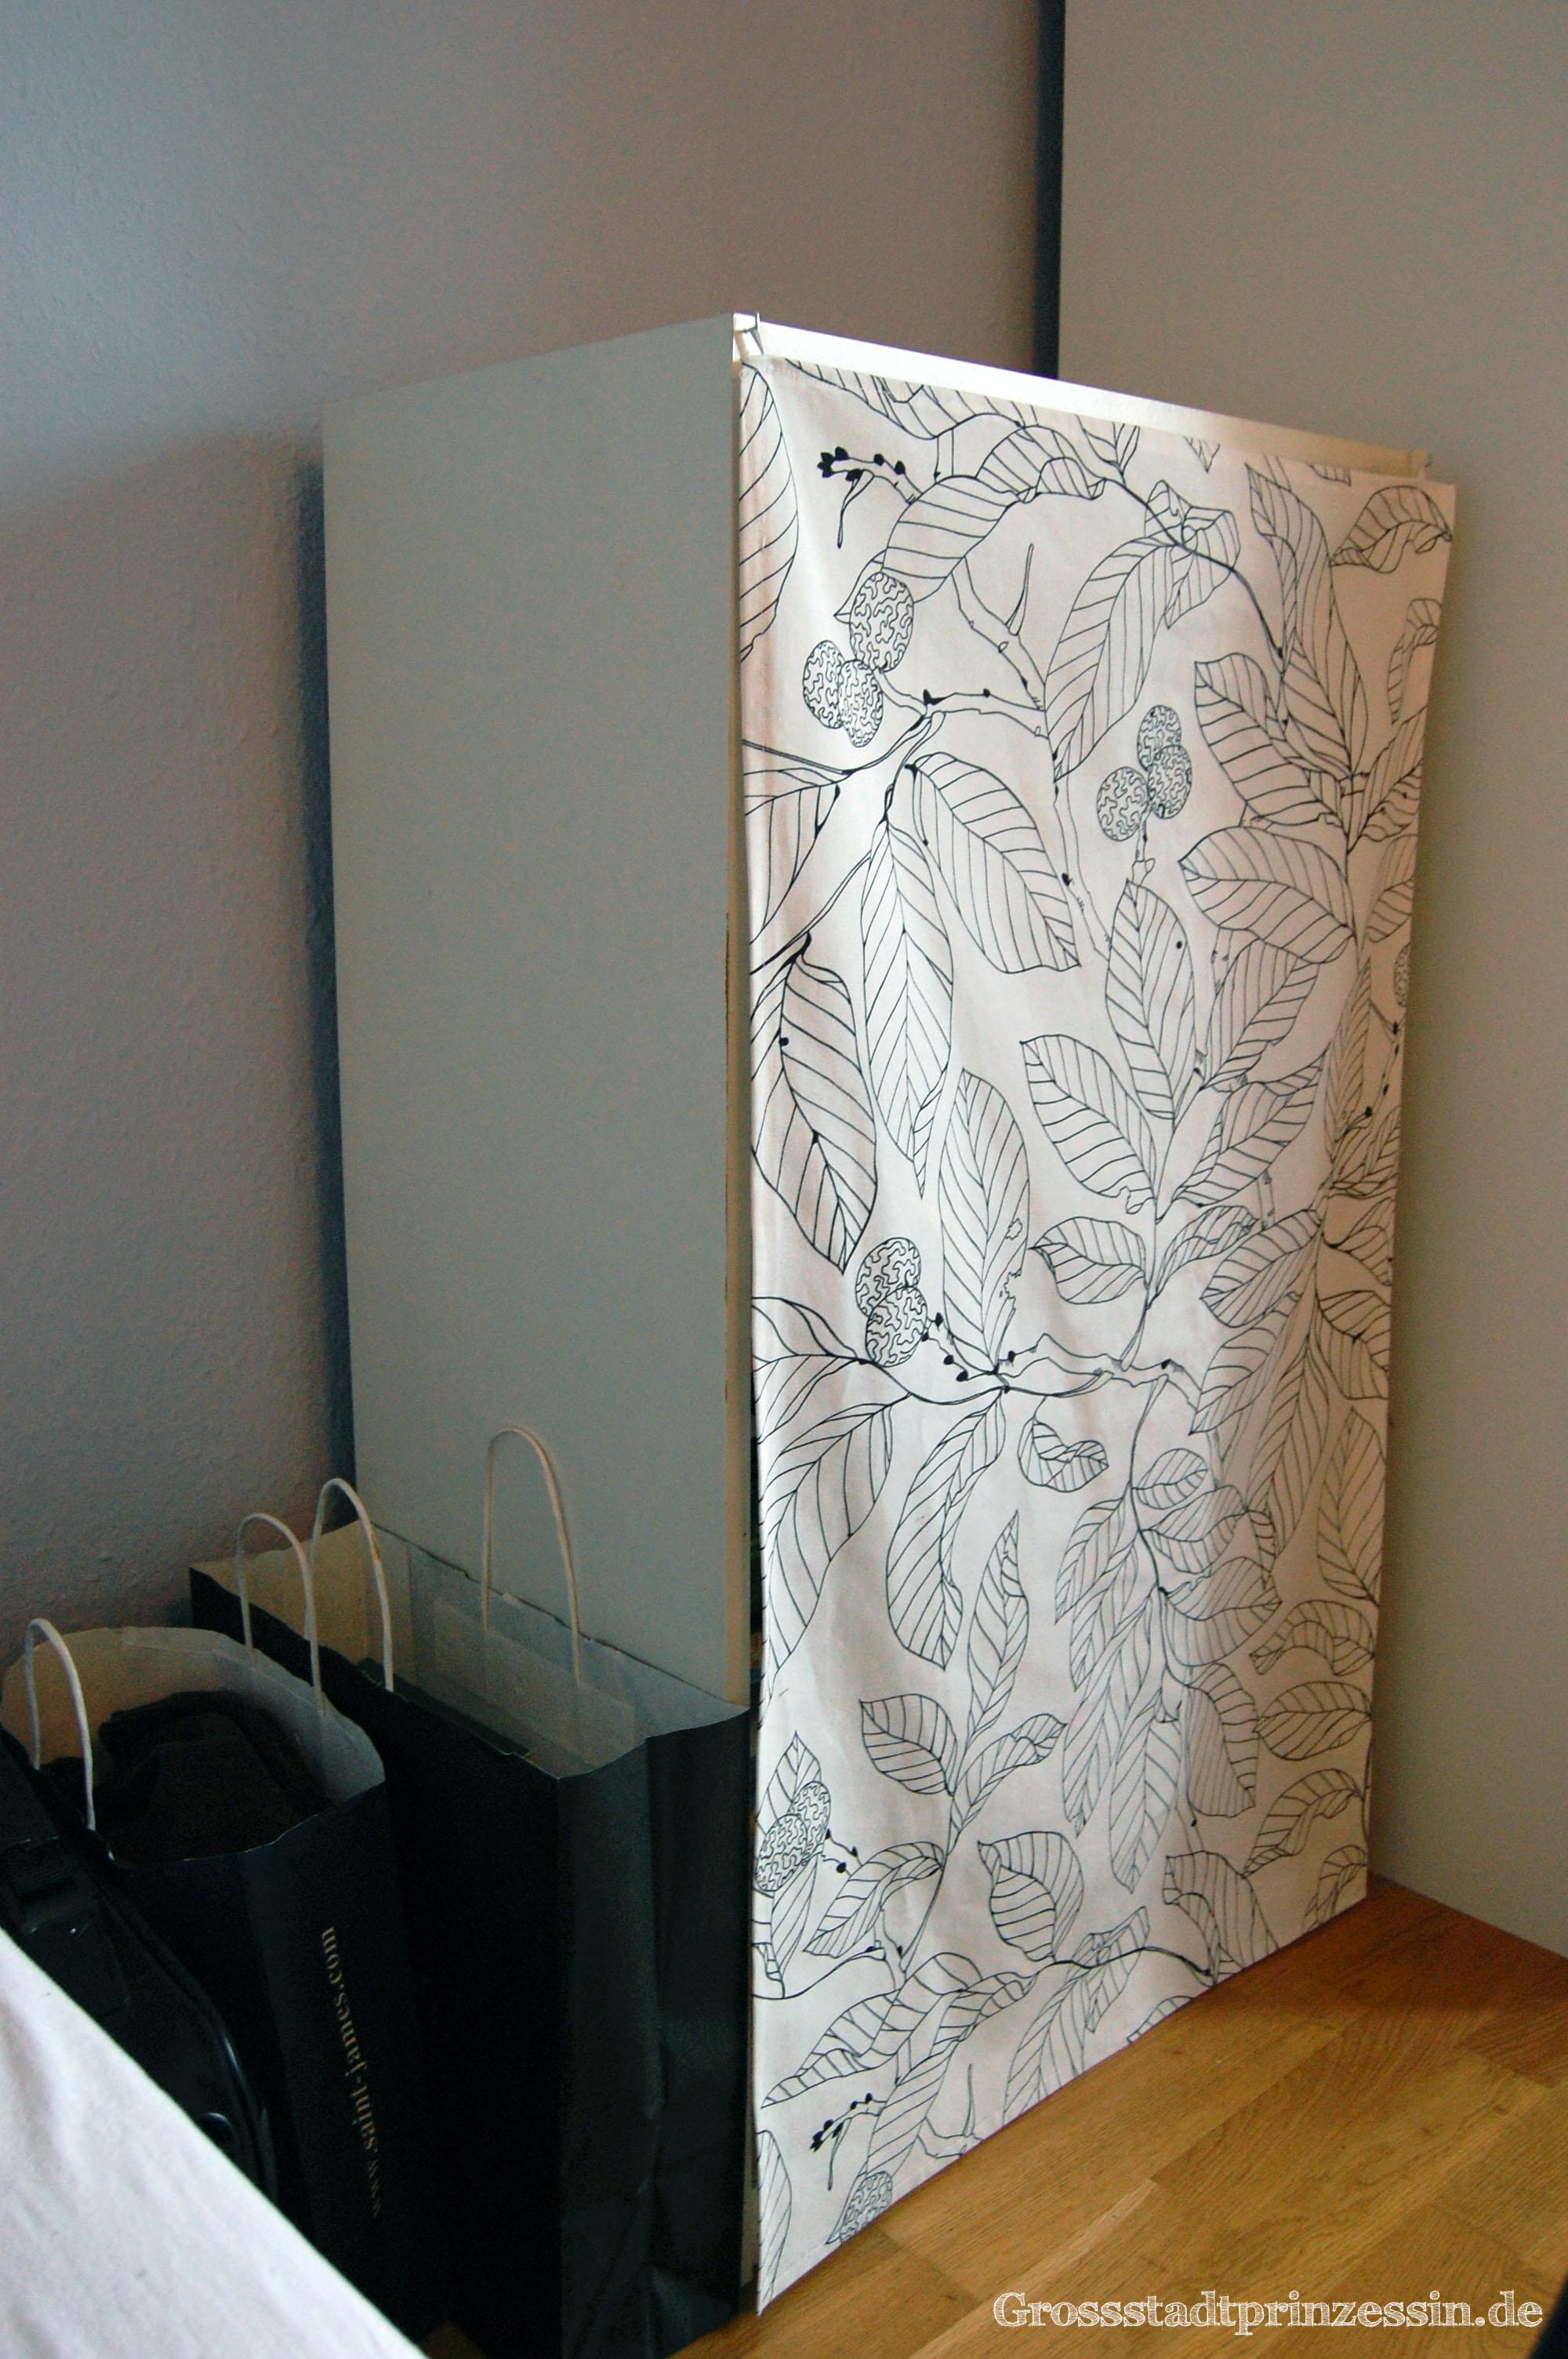 Gardinen deko vorhang k chenregal gardinen dekoration for Vorhang fa r regal